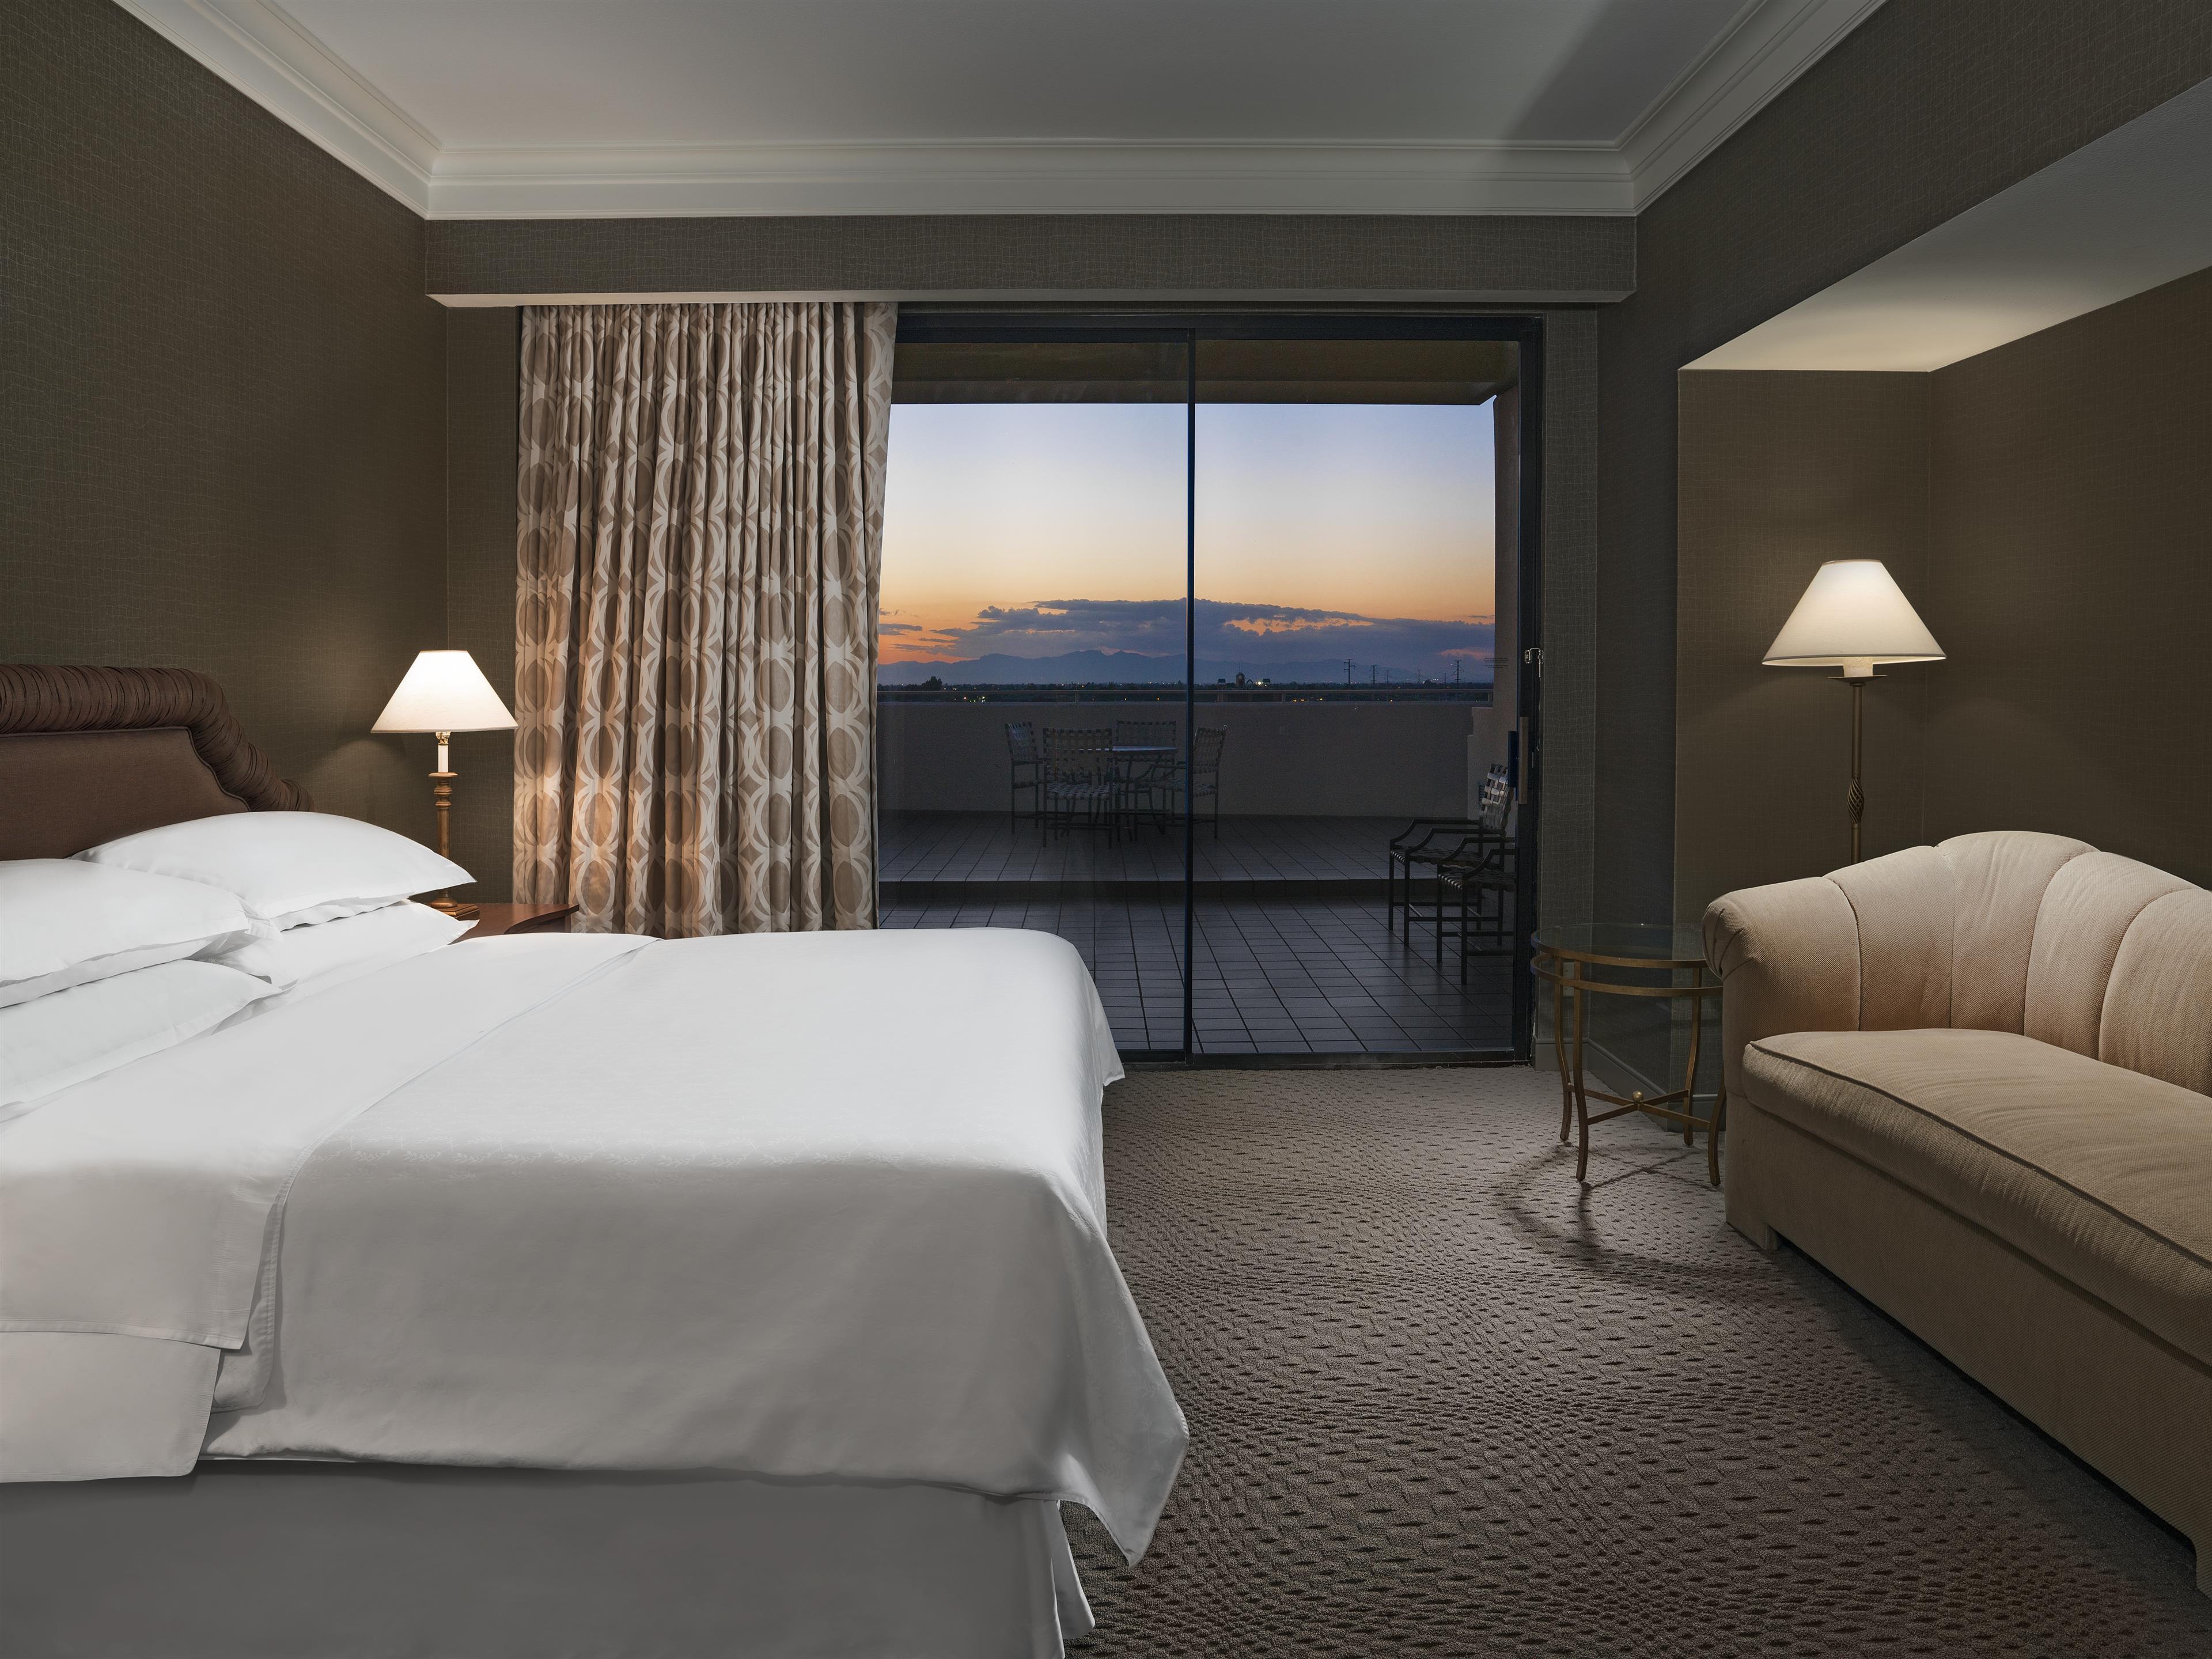 Sheraton Crescent Hotel image 8